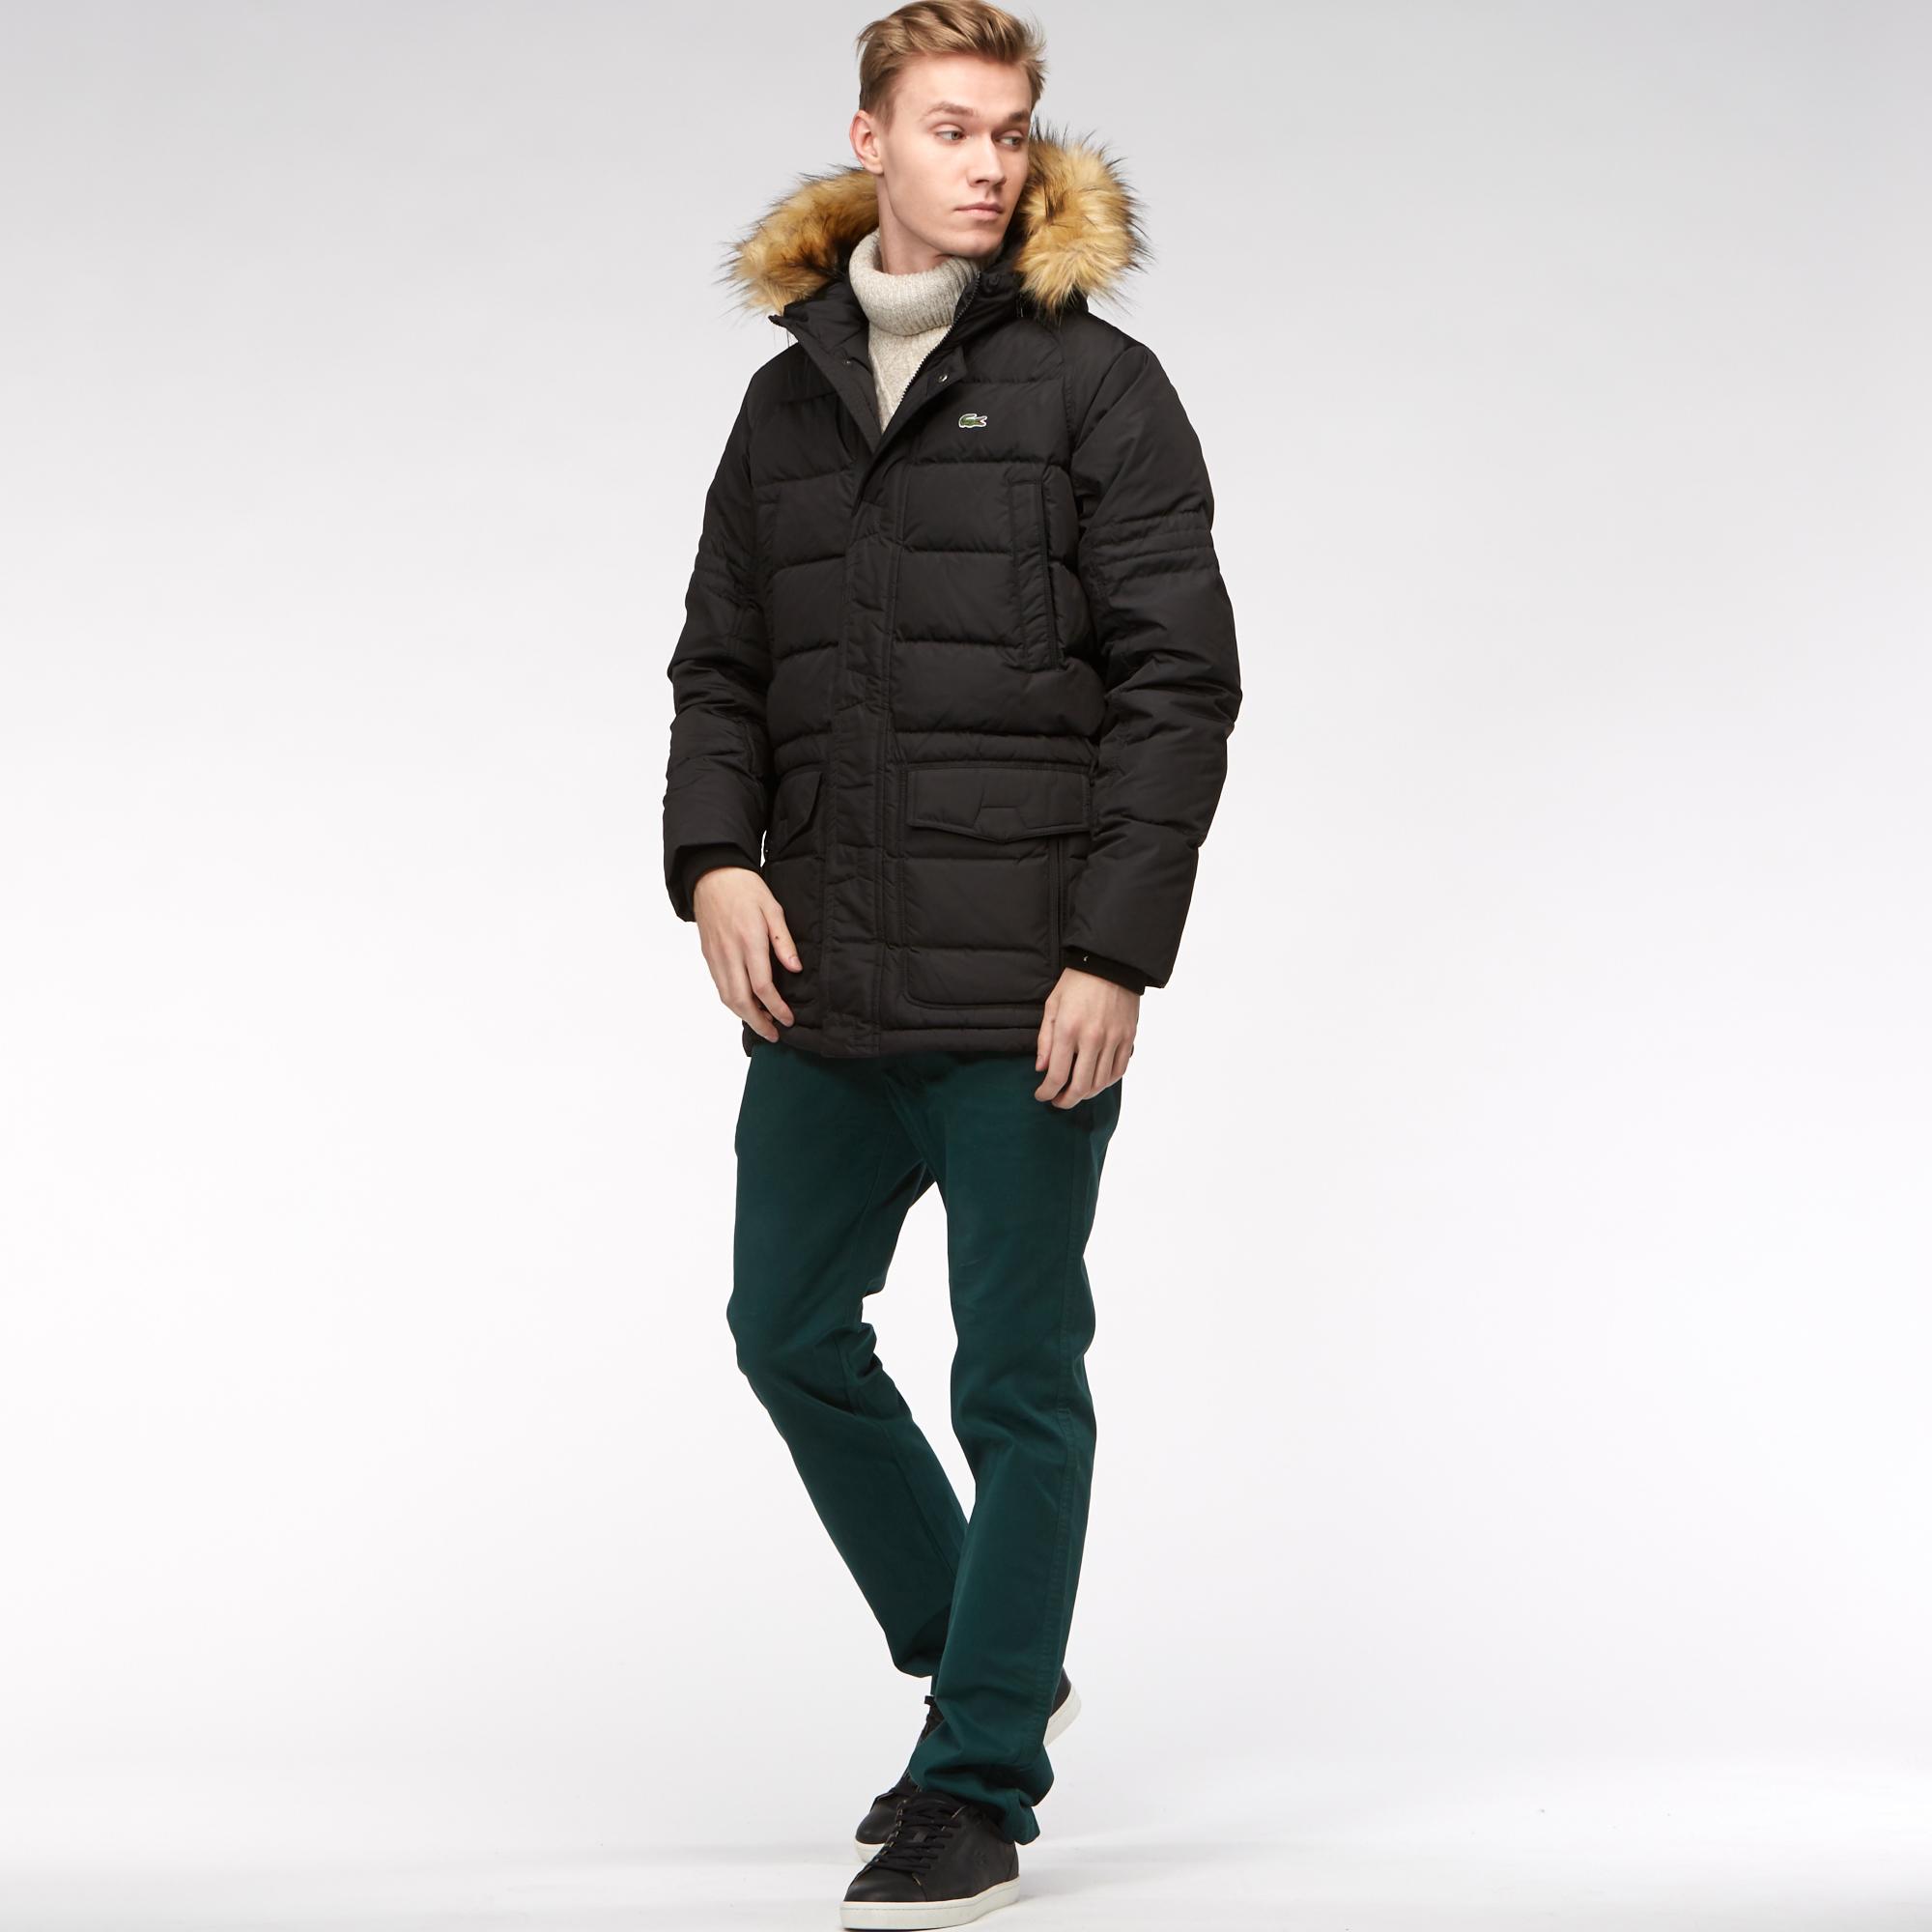 Куртка Lacoste за 27 850 руб. купить в интернет-магазине 295964955e2